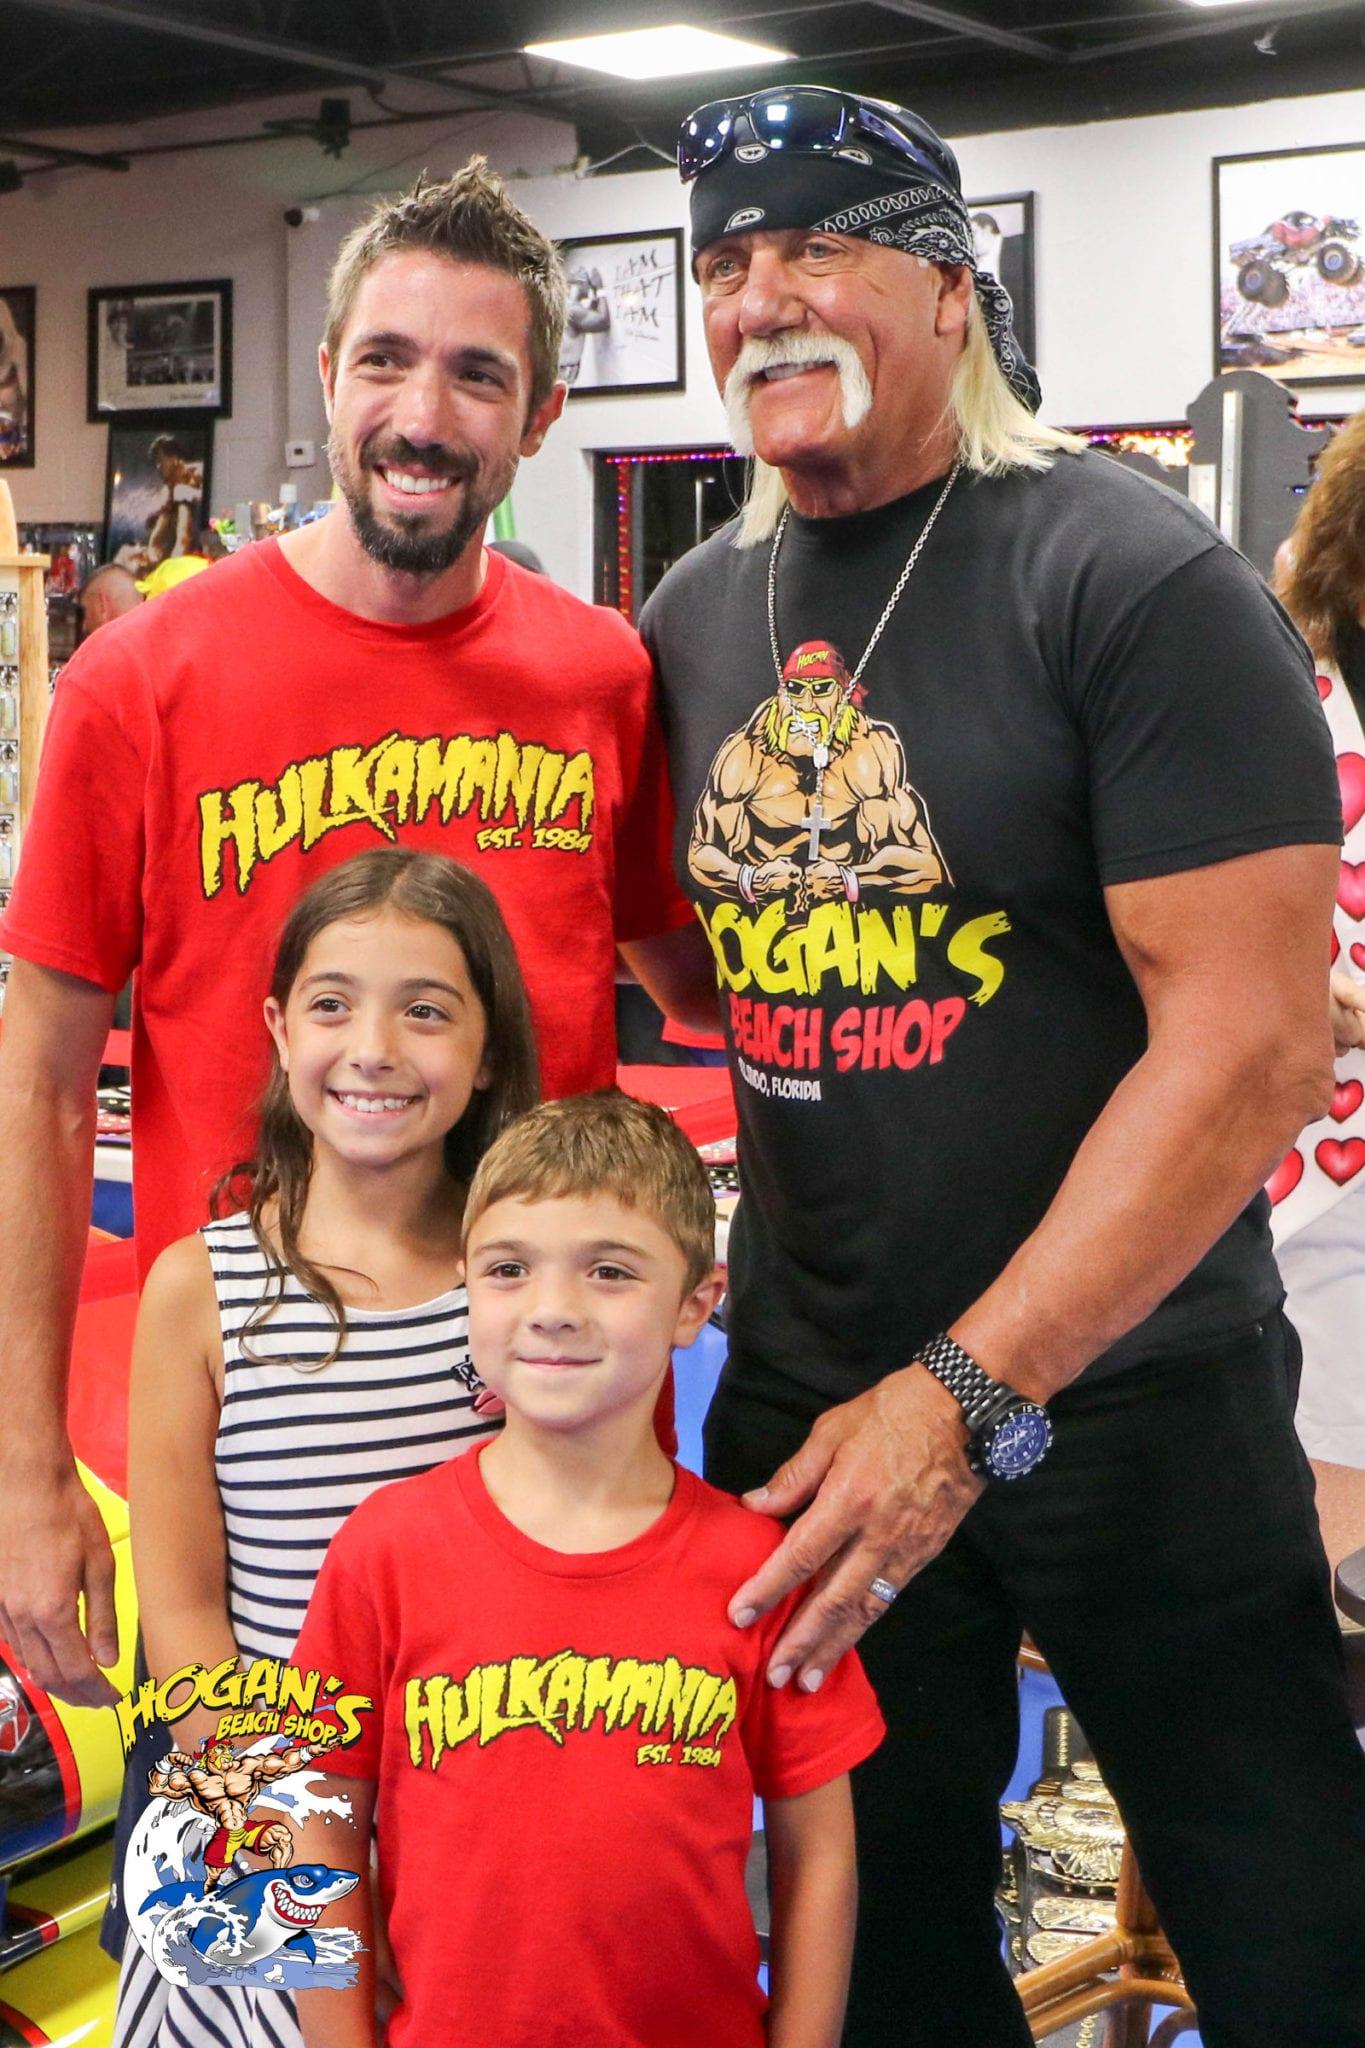 Wrestling Superstars Hulk Hogan And Jimmy Hart Greet Fans At Hogans